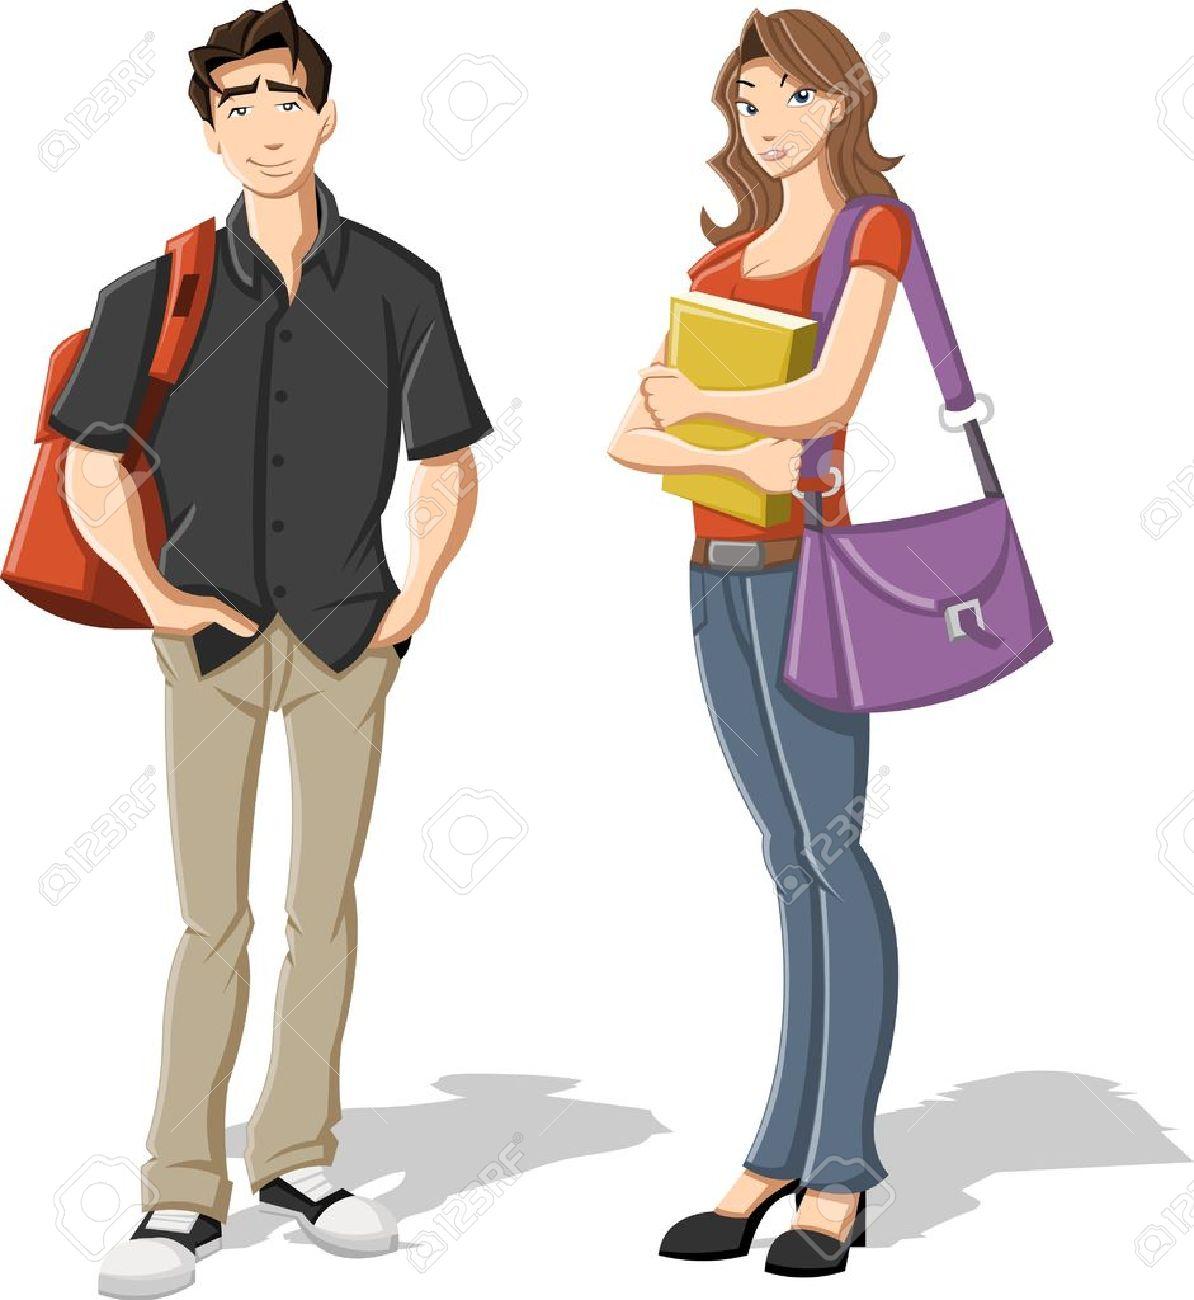 Female Student Clipart